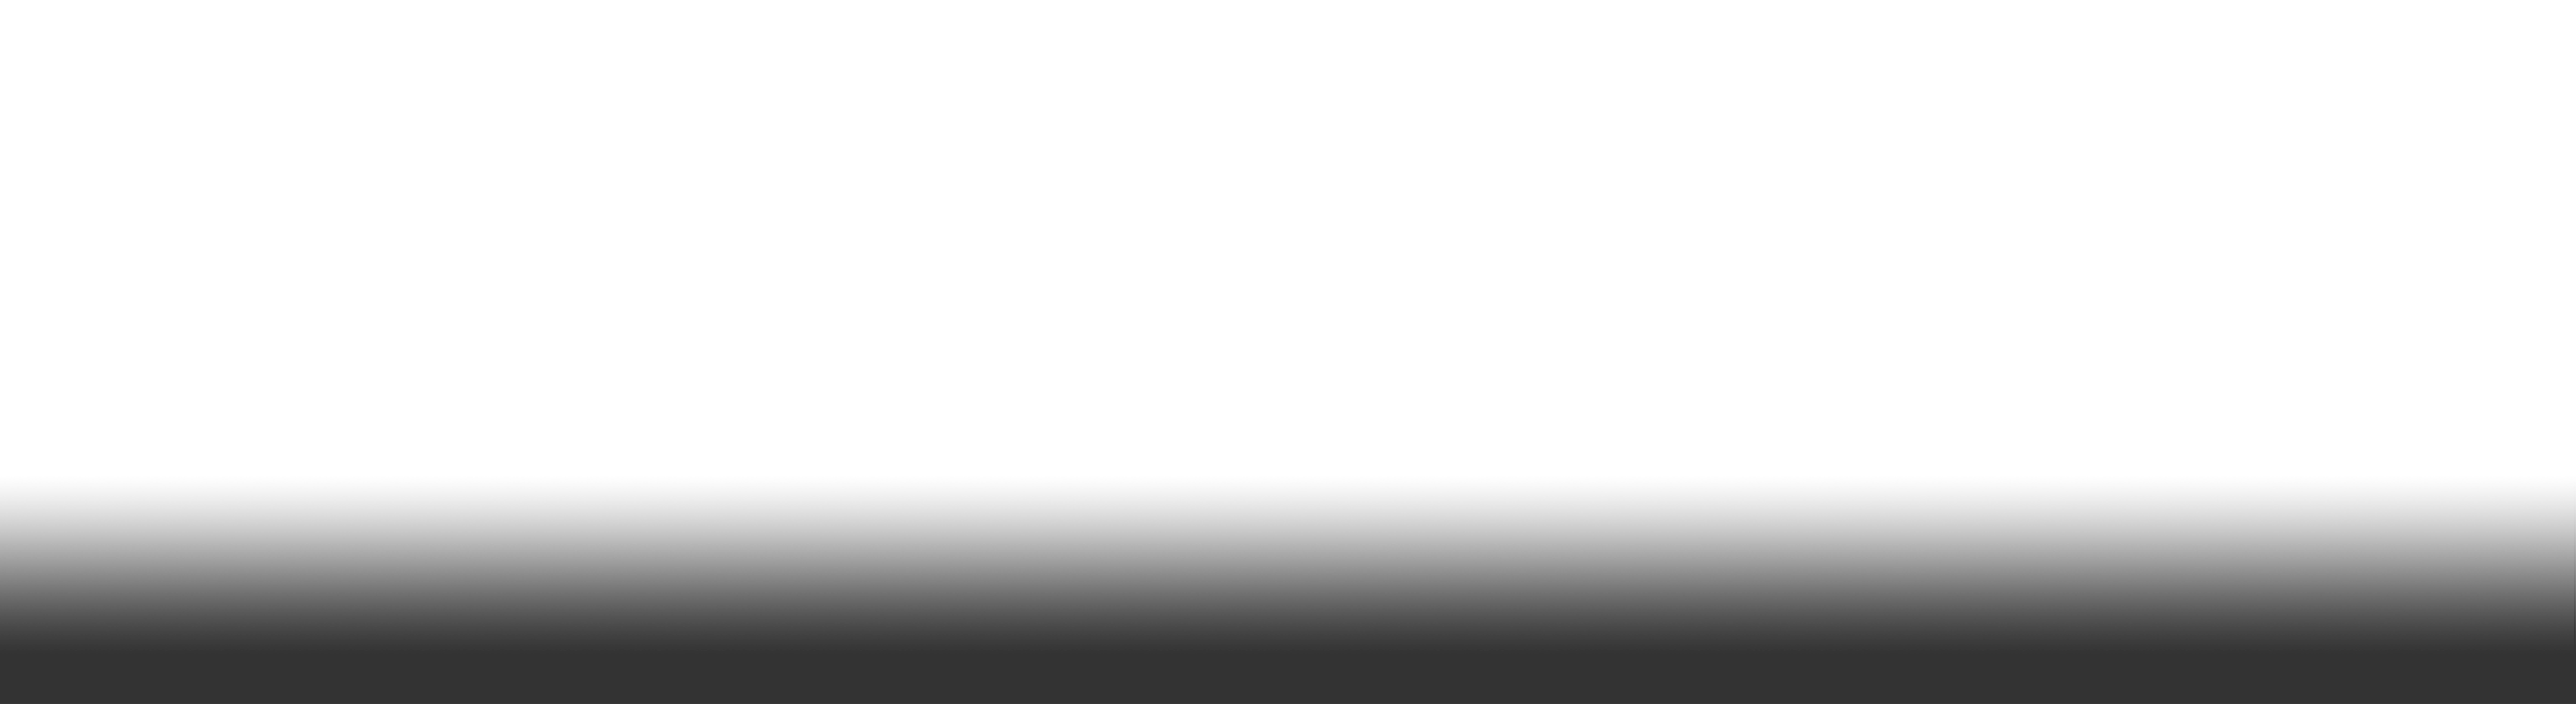 slider-urnaut2.png